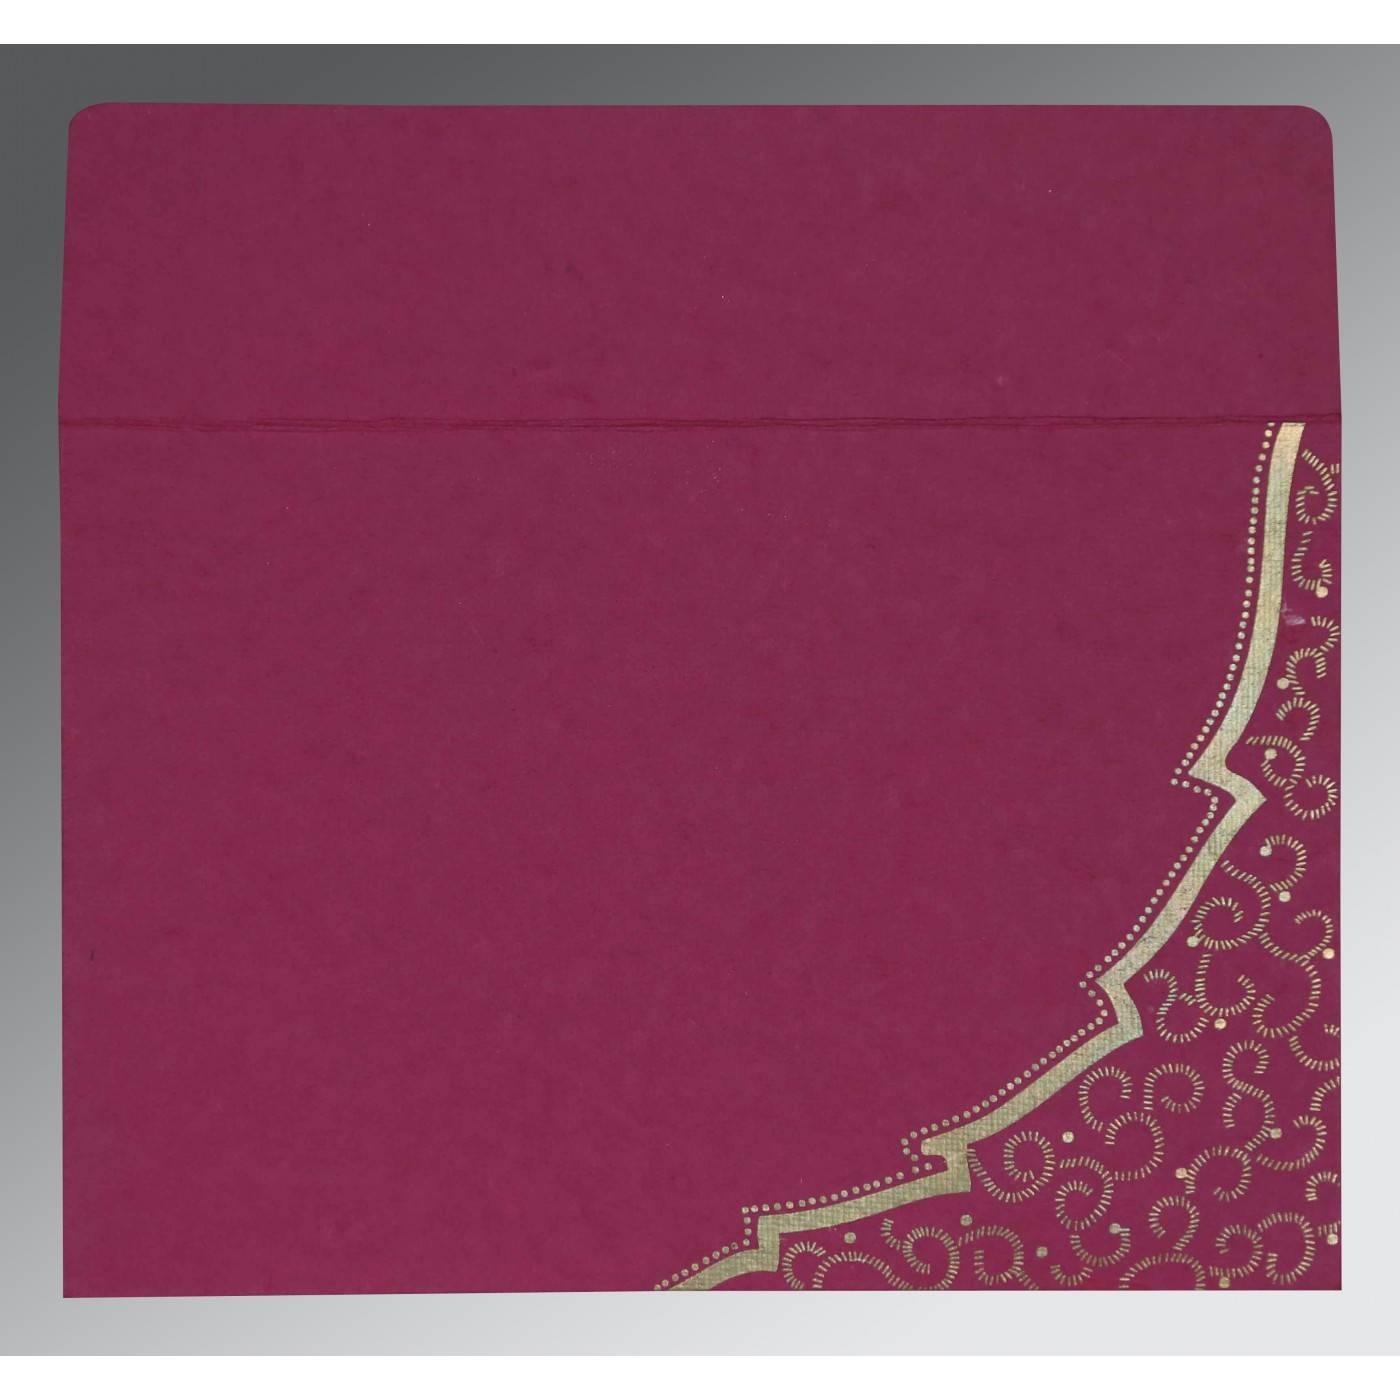 HOT PINK TRANSPARENT HANDMADE COTTON FLORAL THEMED - FOIL STAMPED WEDDING CARD : CRU-8219F - IndianWeddingCards